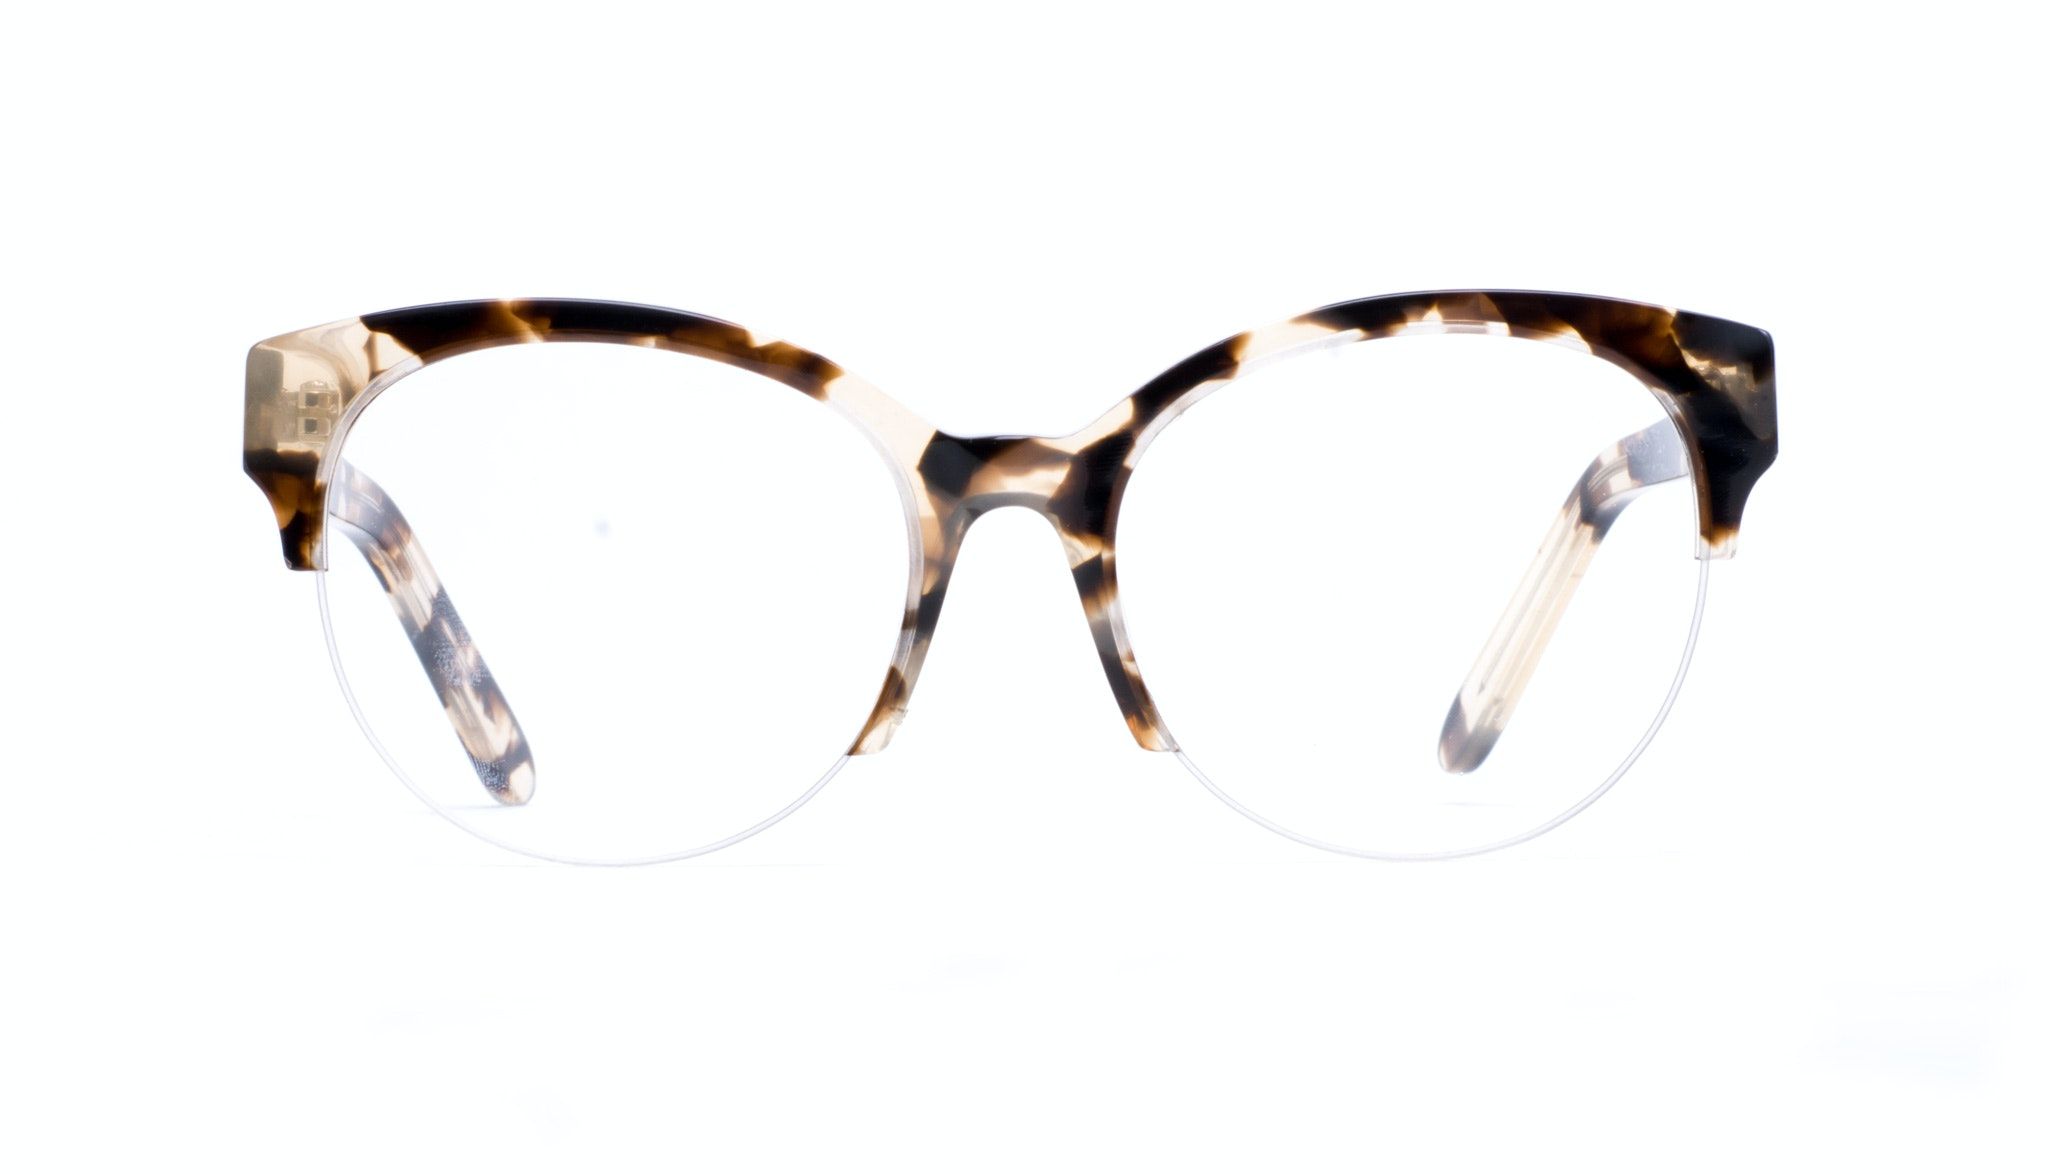 Affordable Fashion Glasses Cat Eye Round Semi-Rimless Eyeglasses Women Eclipse Light Mocha Tortoise II Front